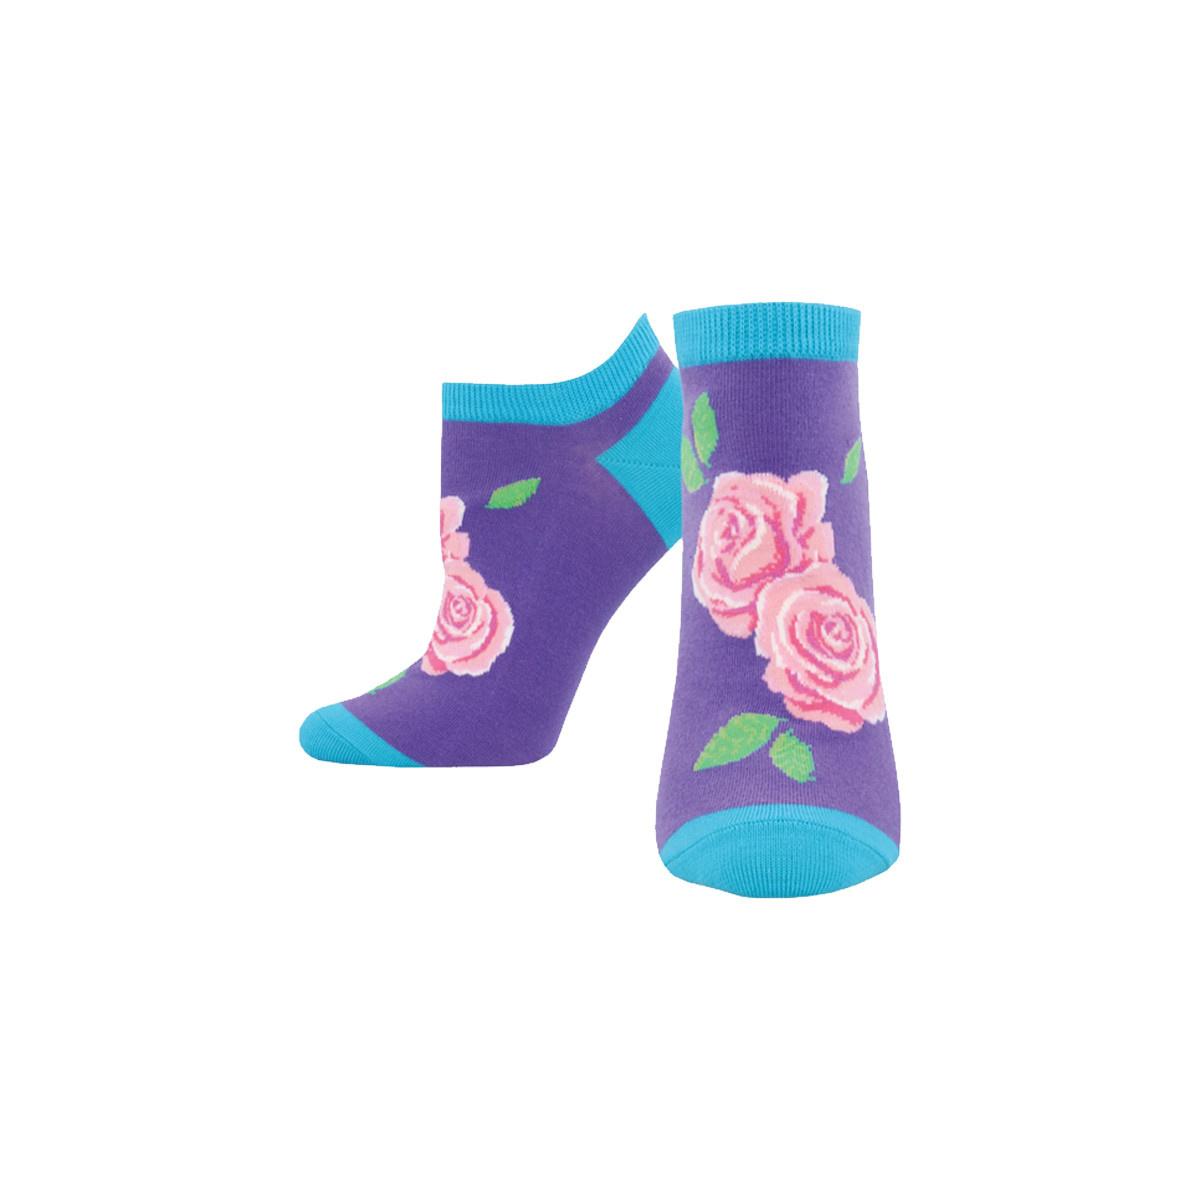 Socksmith Socksmith Women's Shortie Socks Best Buds